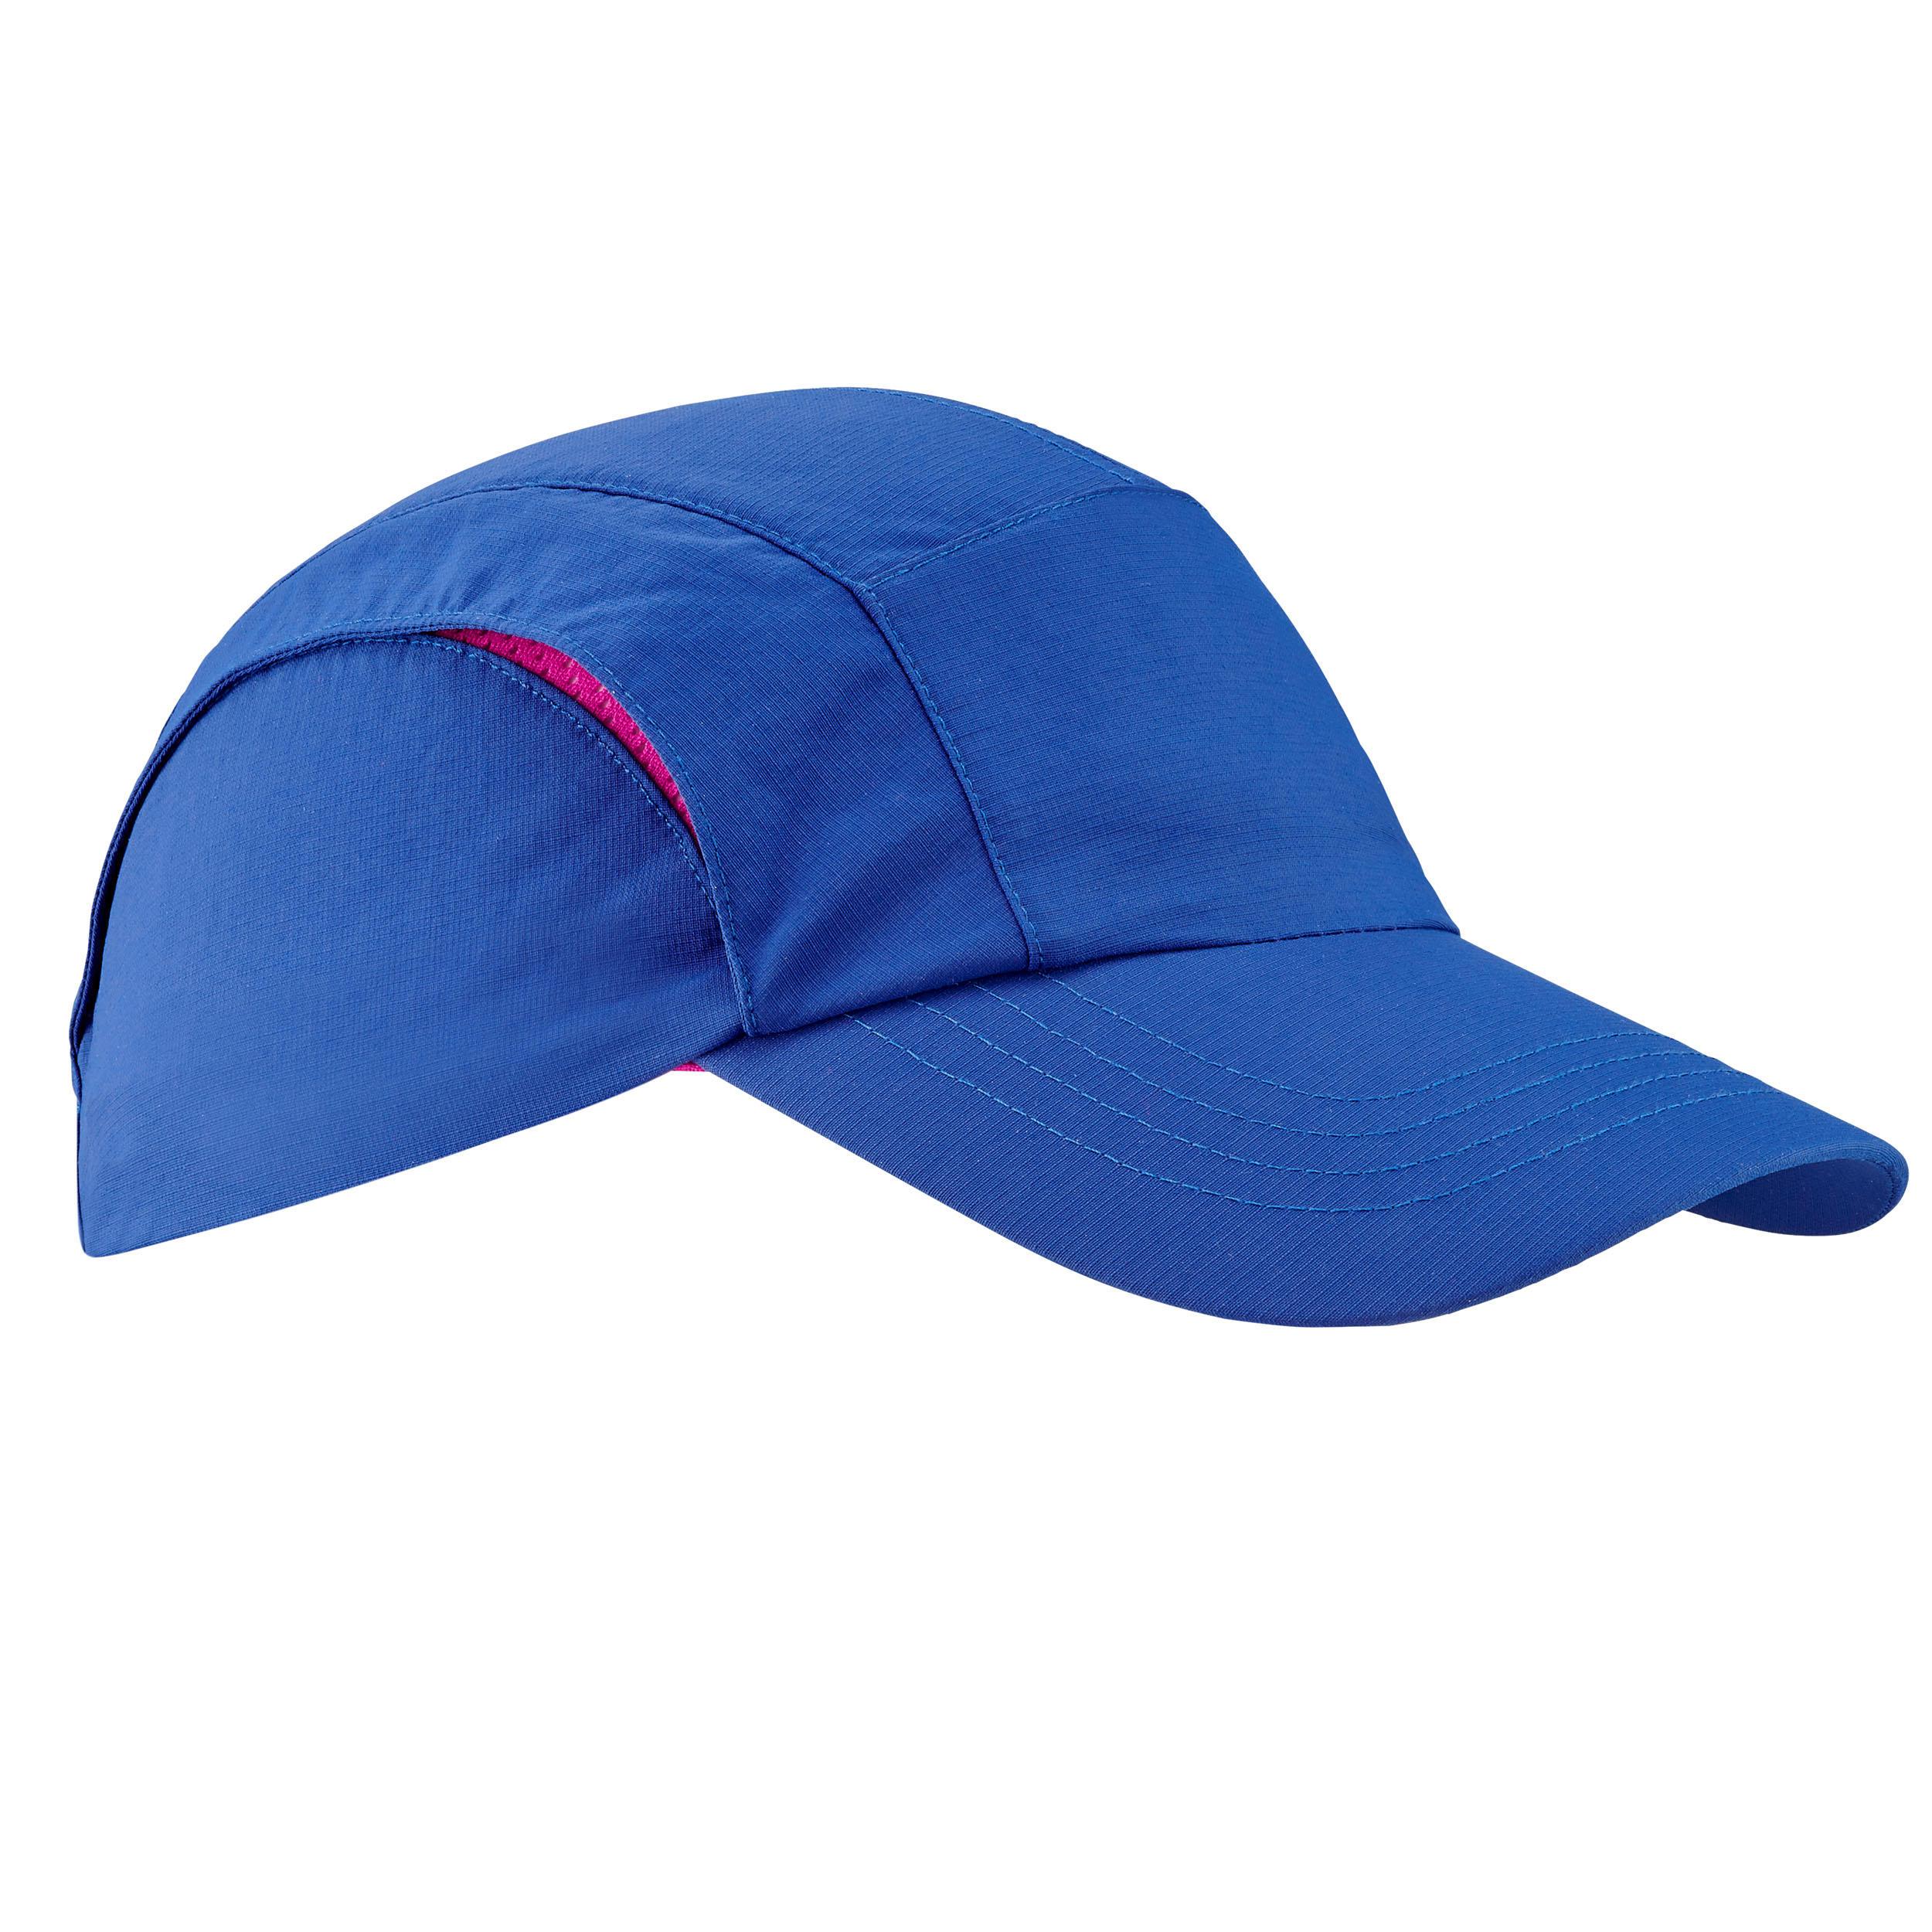 Șapcă MH500 copii imagine